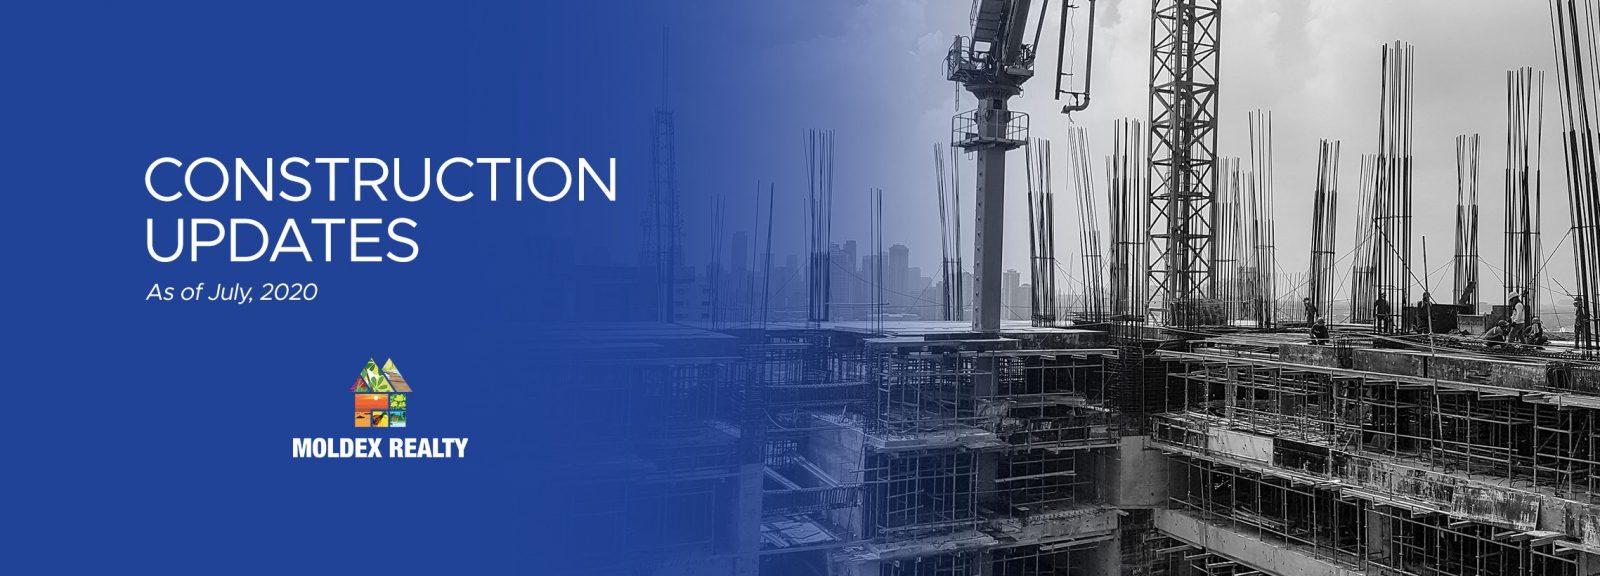 Construction Updates (July 2020)